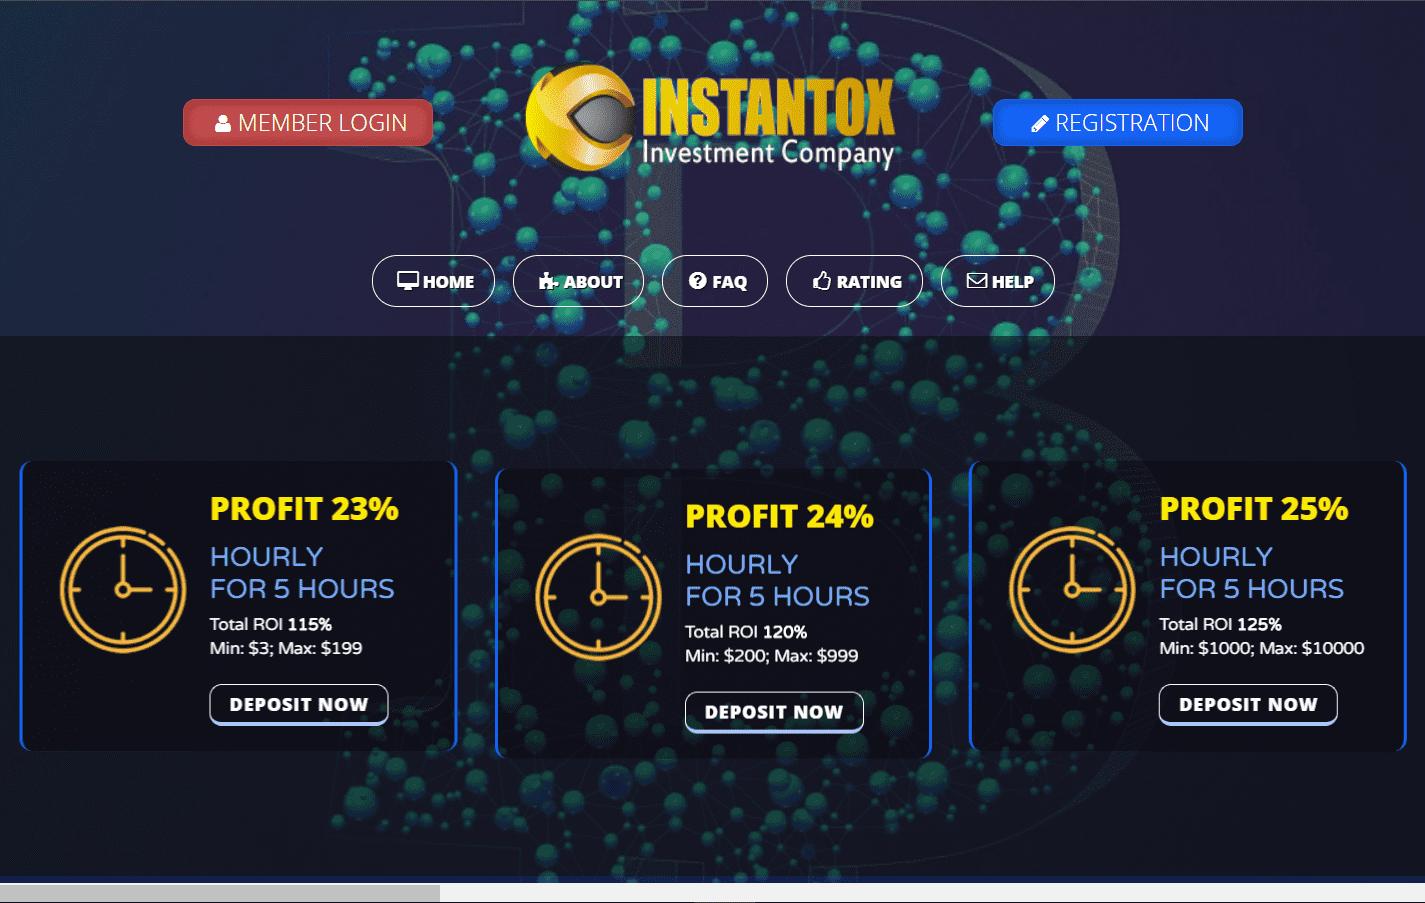 Instantox Investment